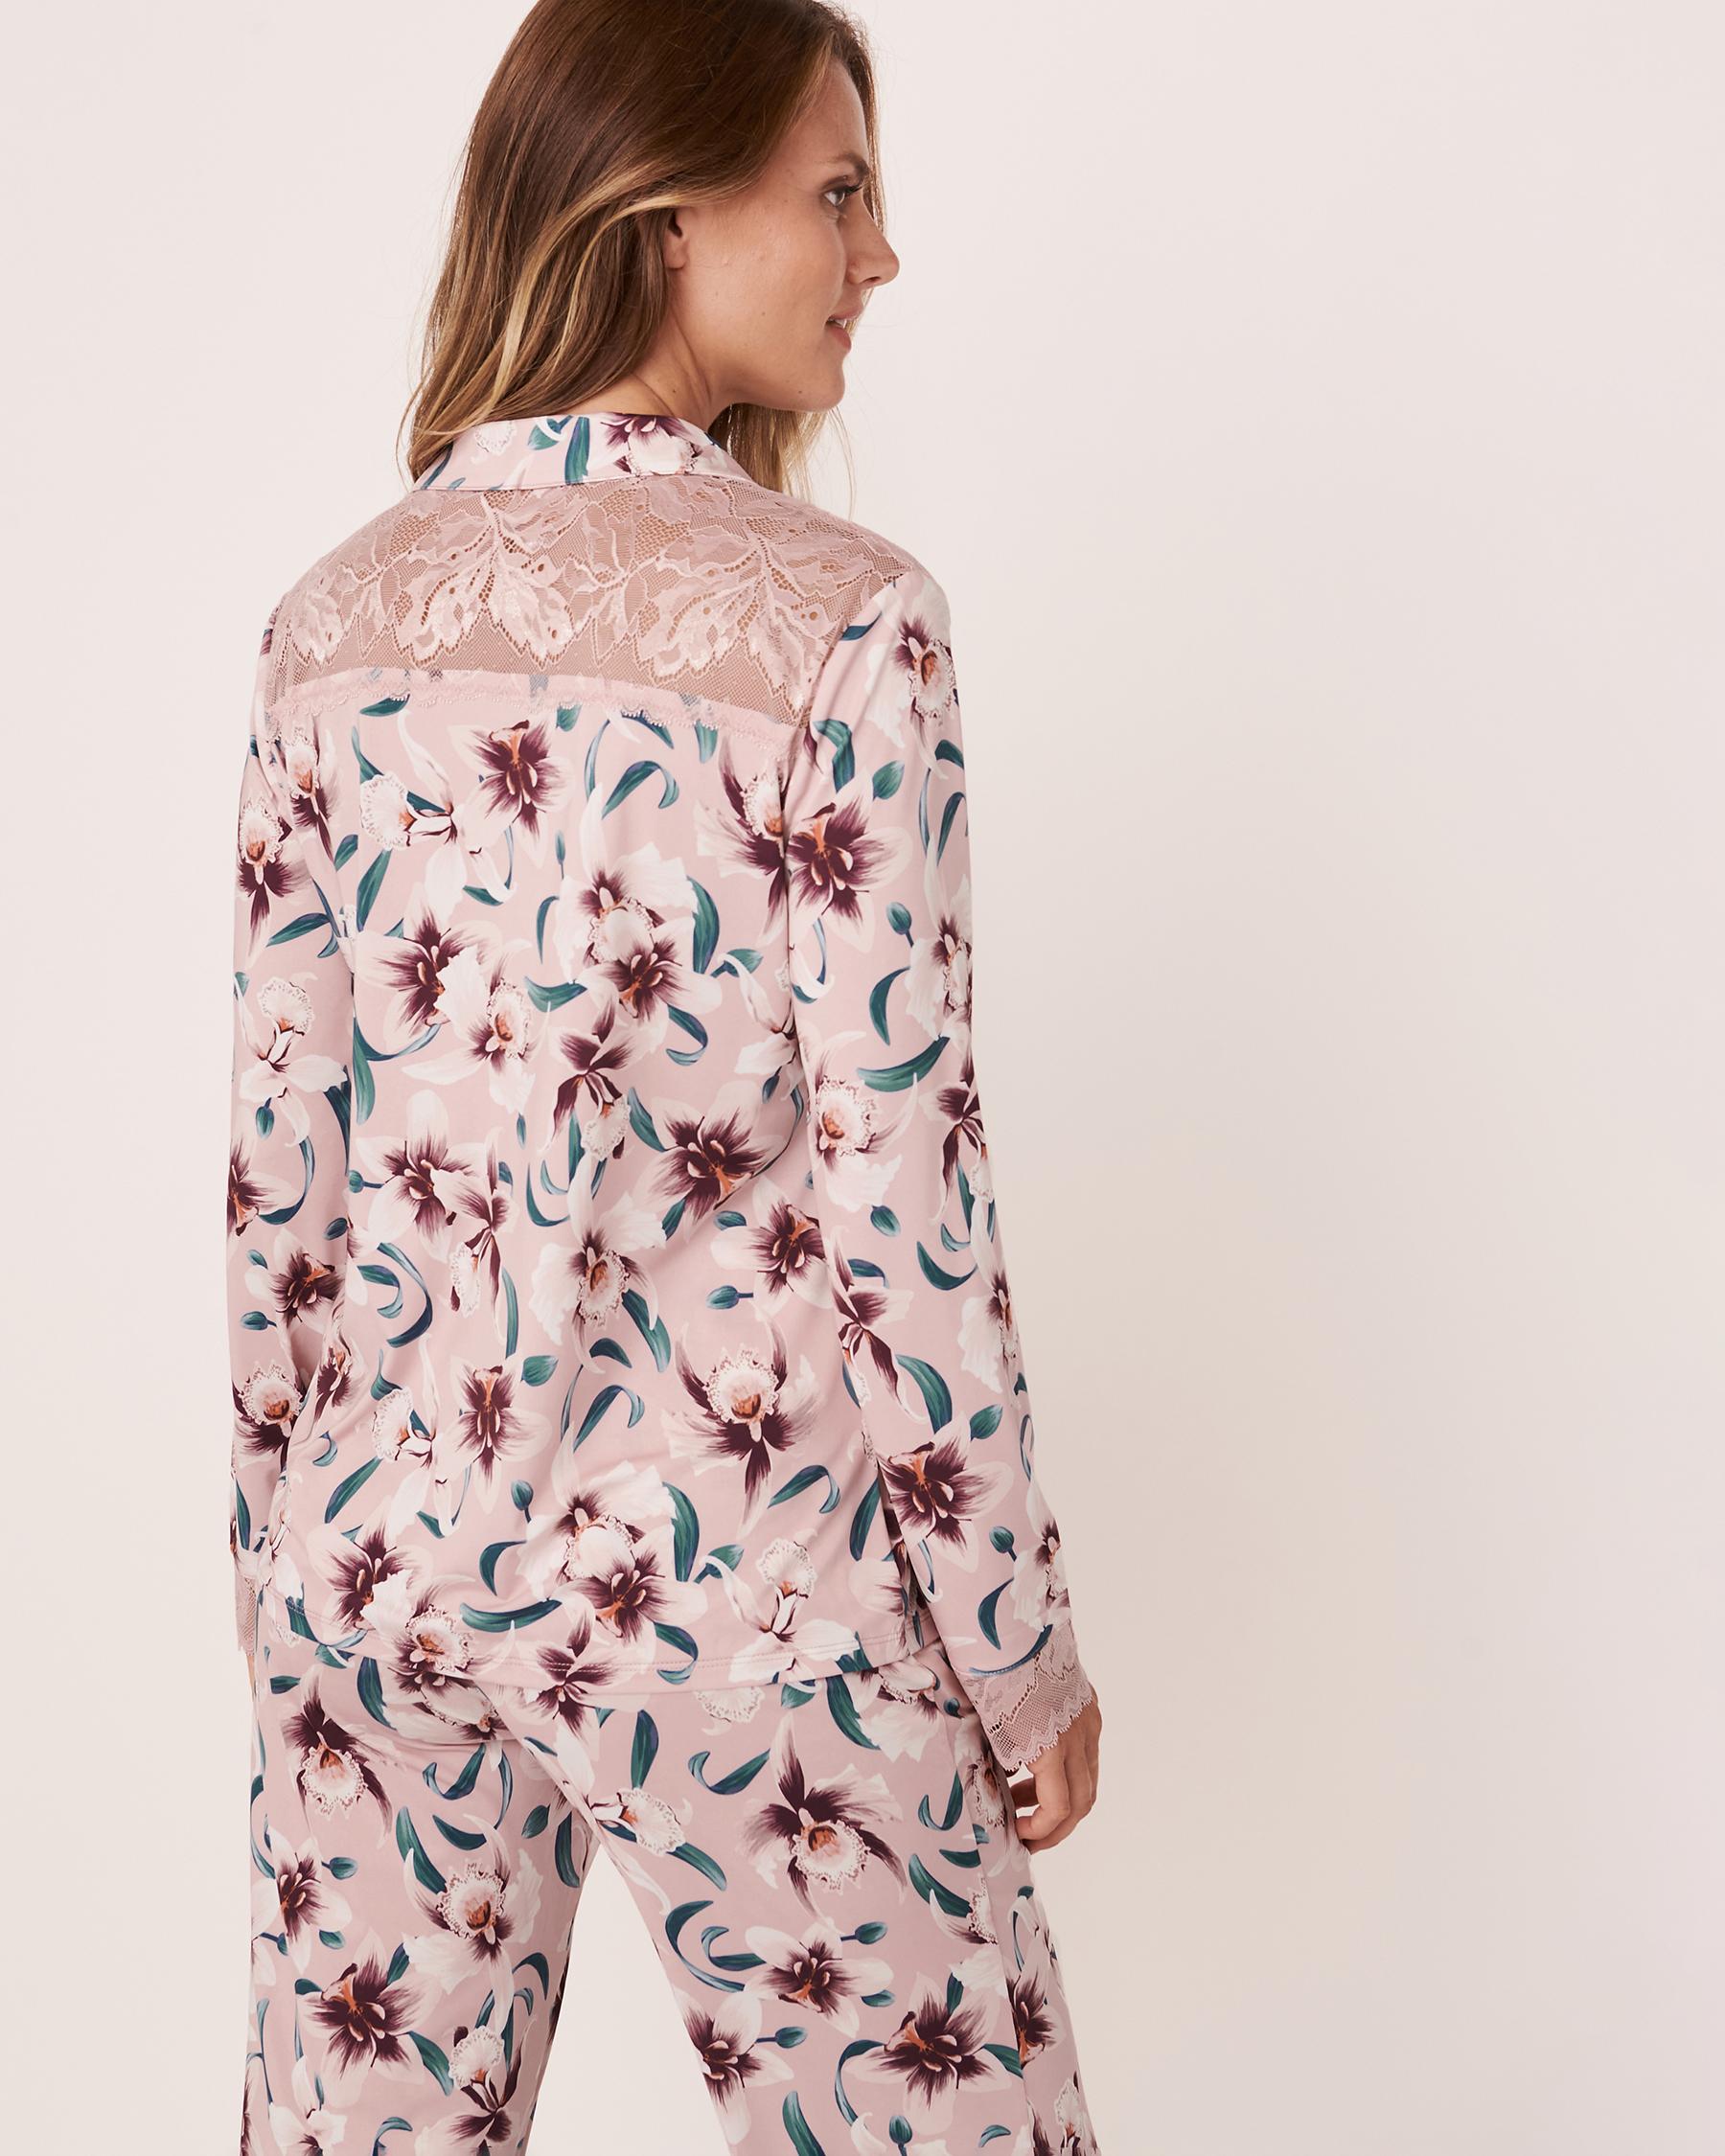 LA VIE EN ROSE Recycled Fibers Lace Trim Long Sleeve Shirt Orchids 60100004 - View2